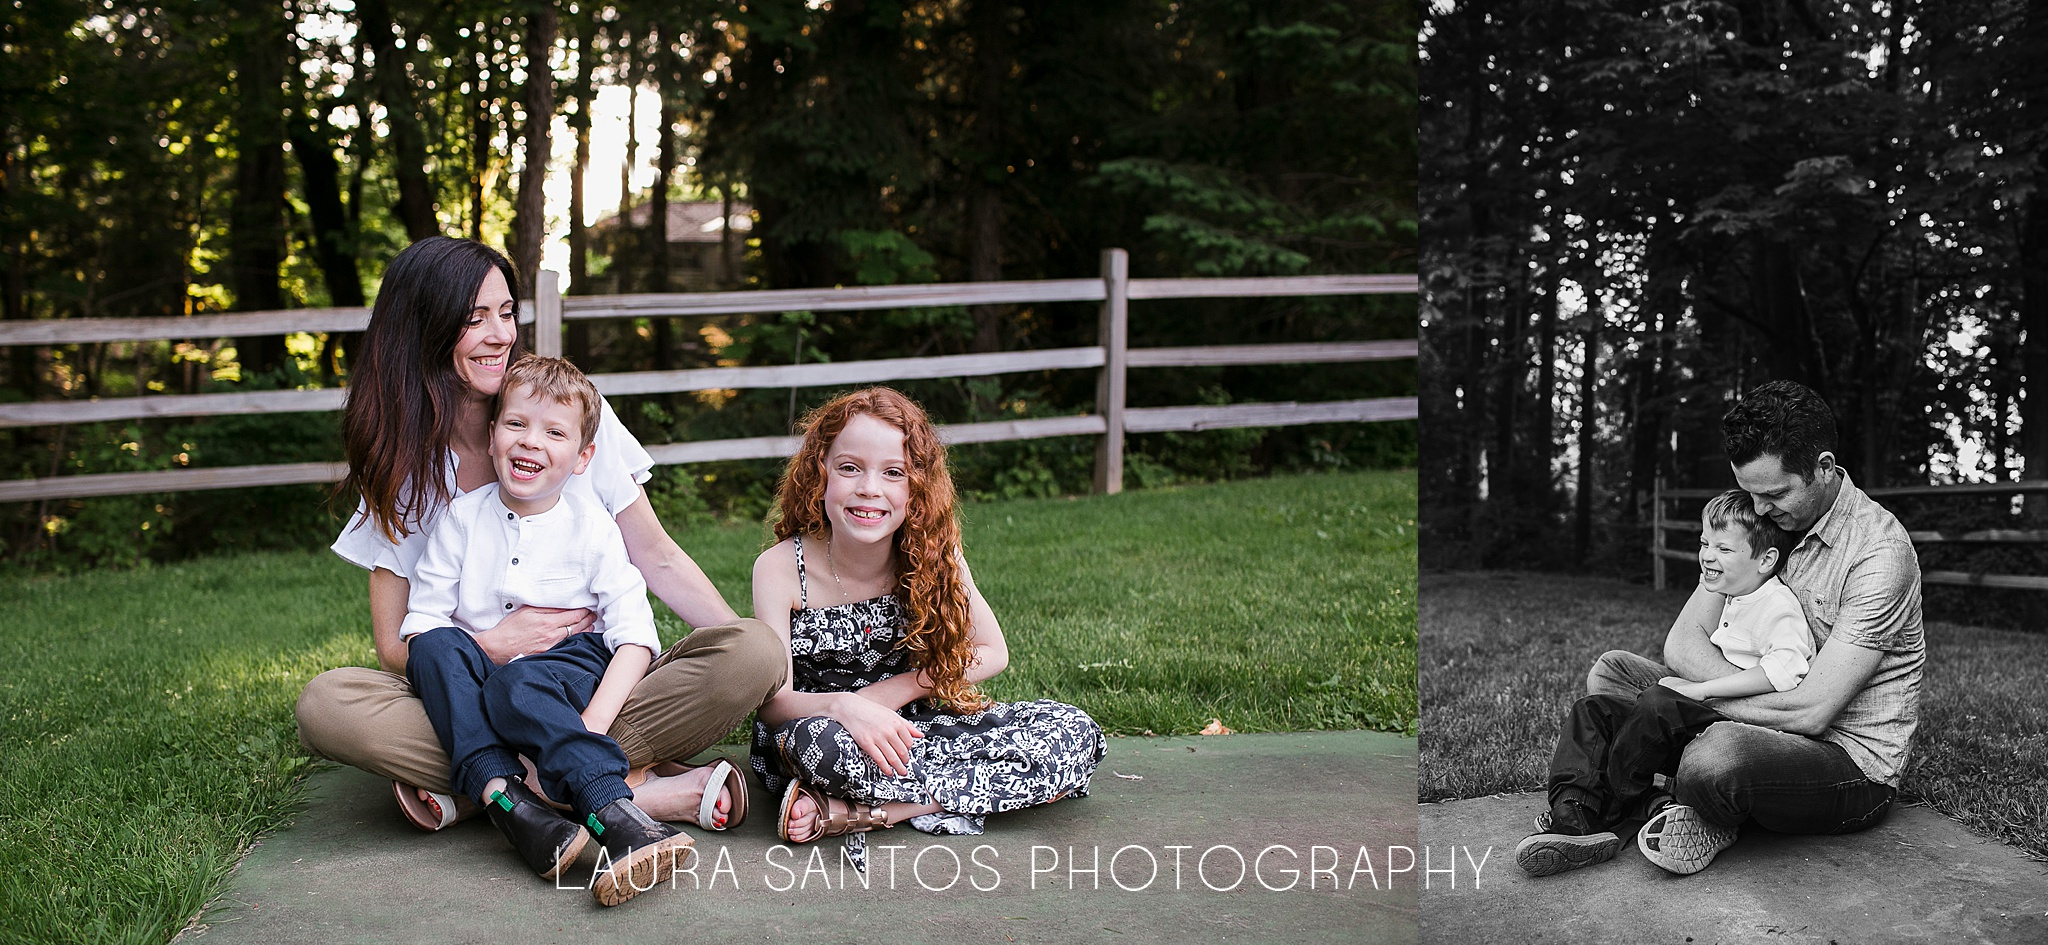 Laura Santos Photography Portland Oregon Family Photographer_0973.jpg